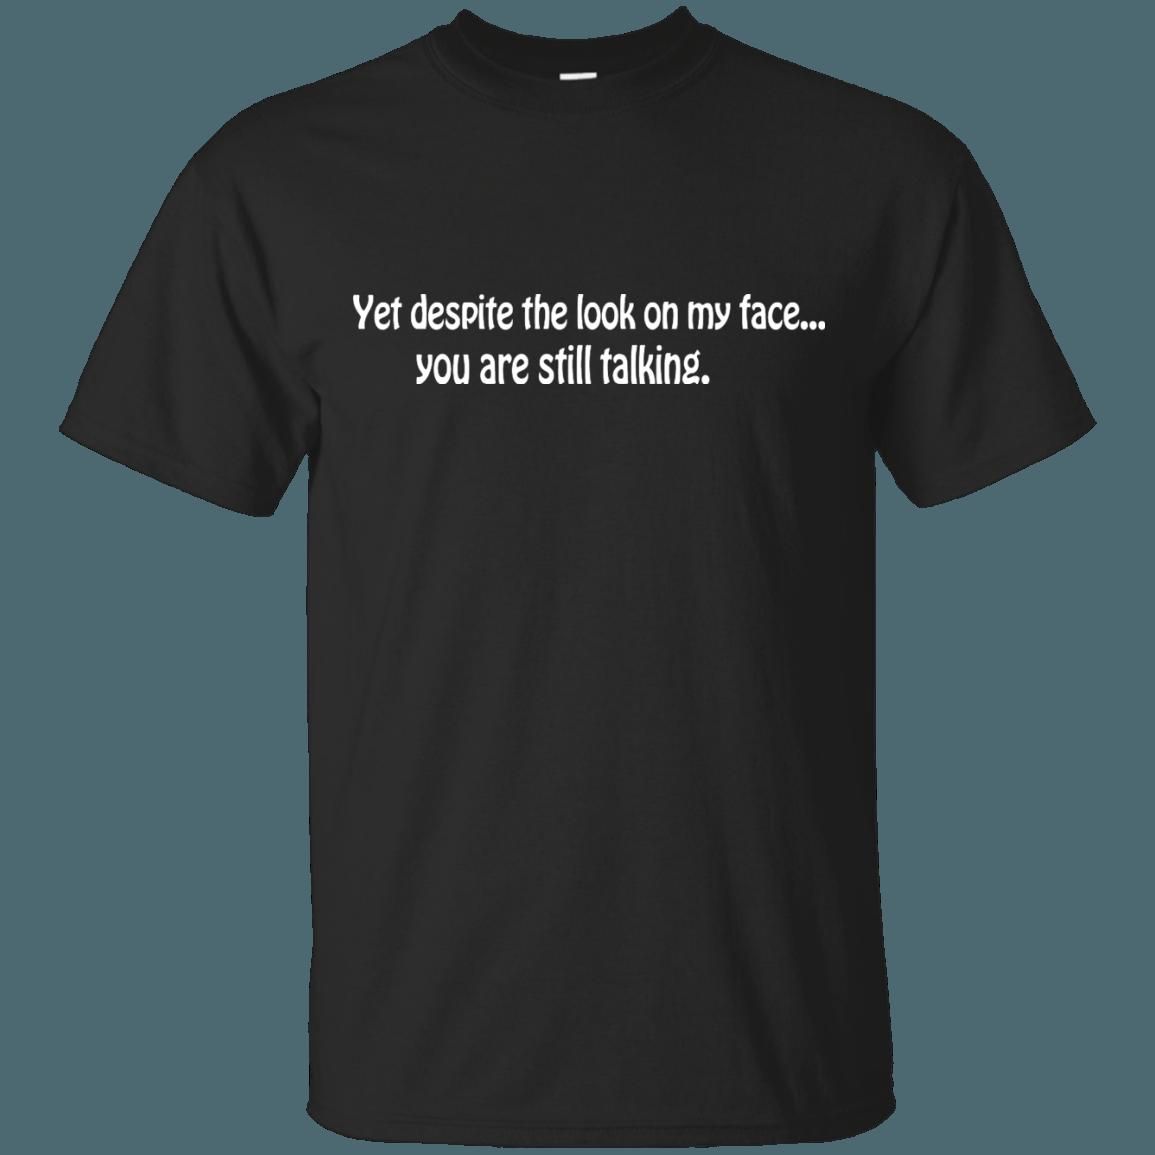 Amazon.com: despite the look on my face t shirt